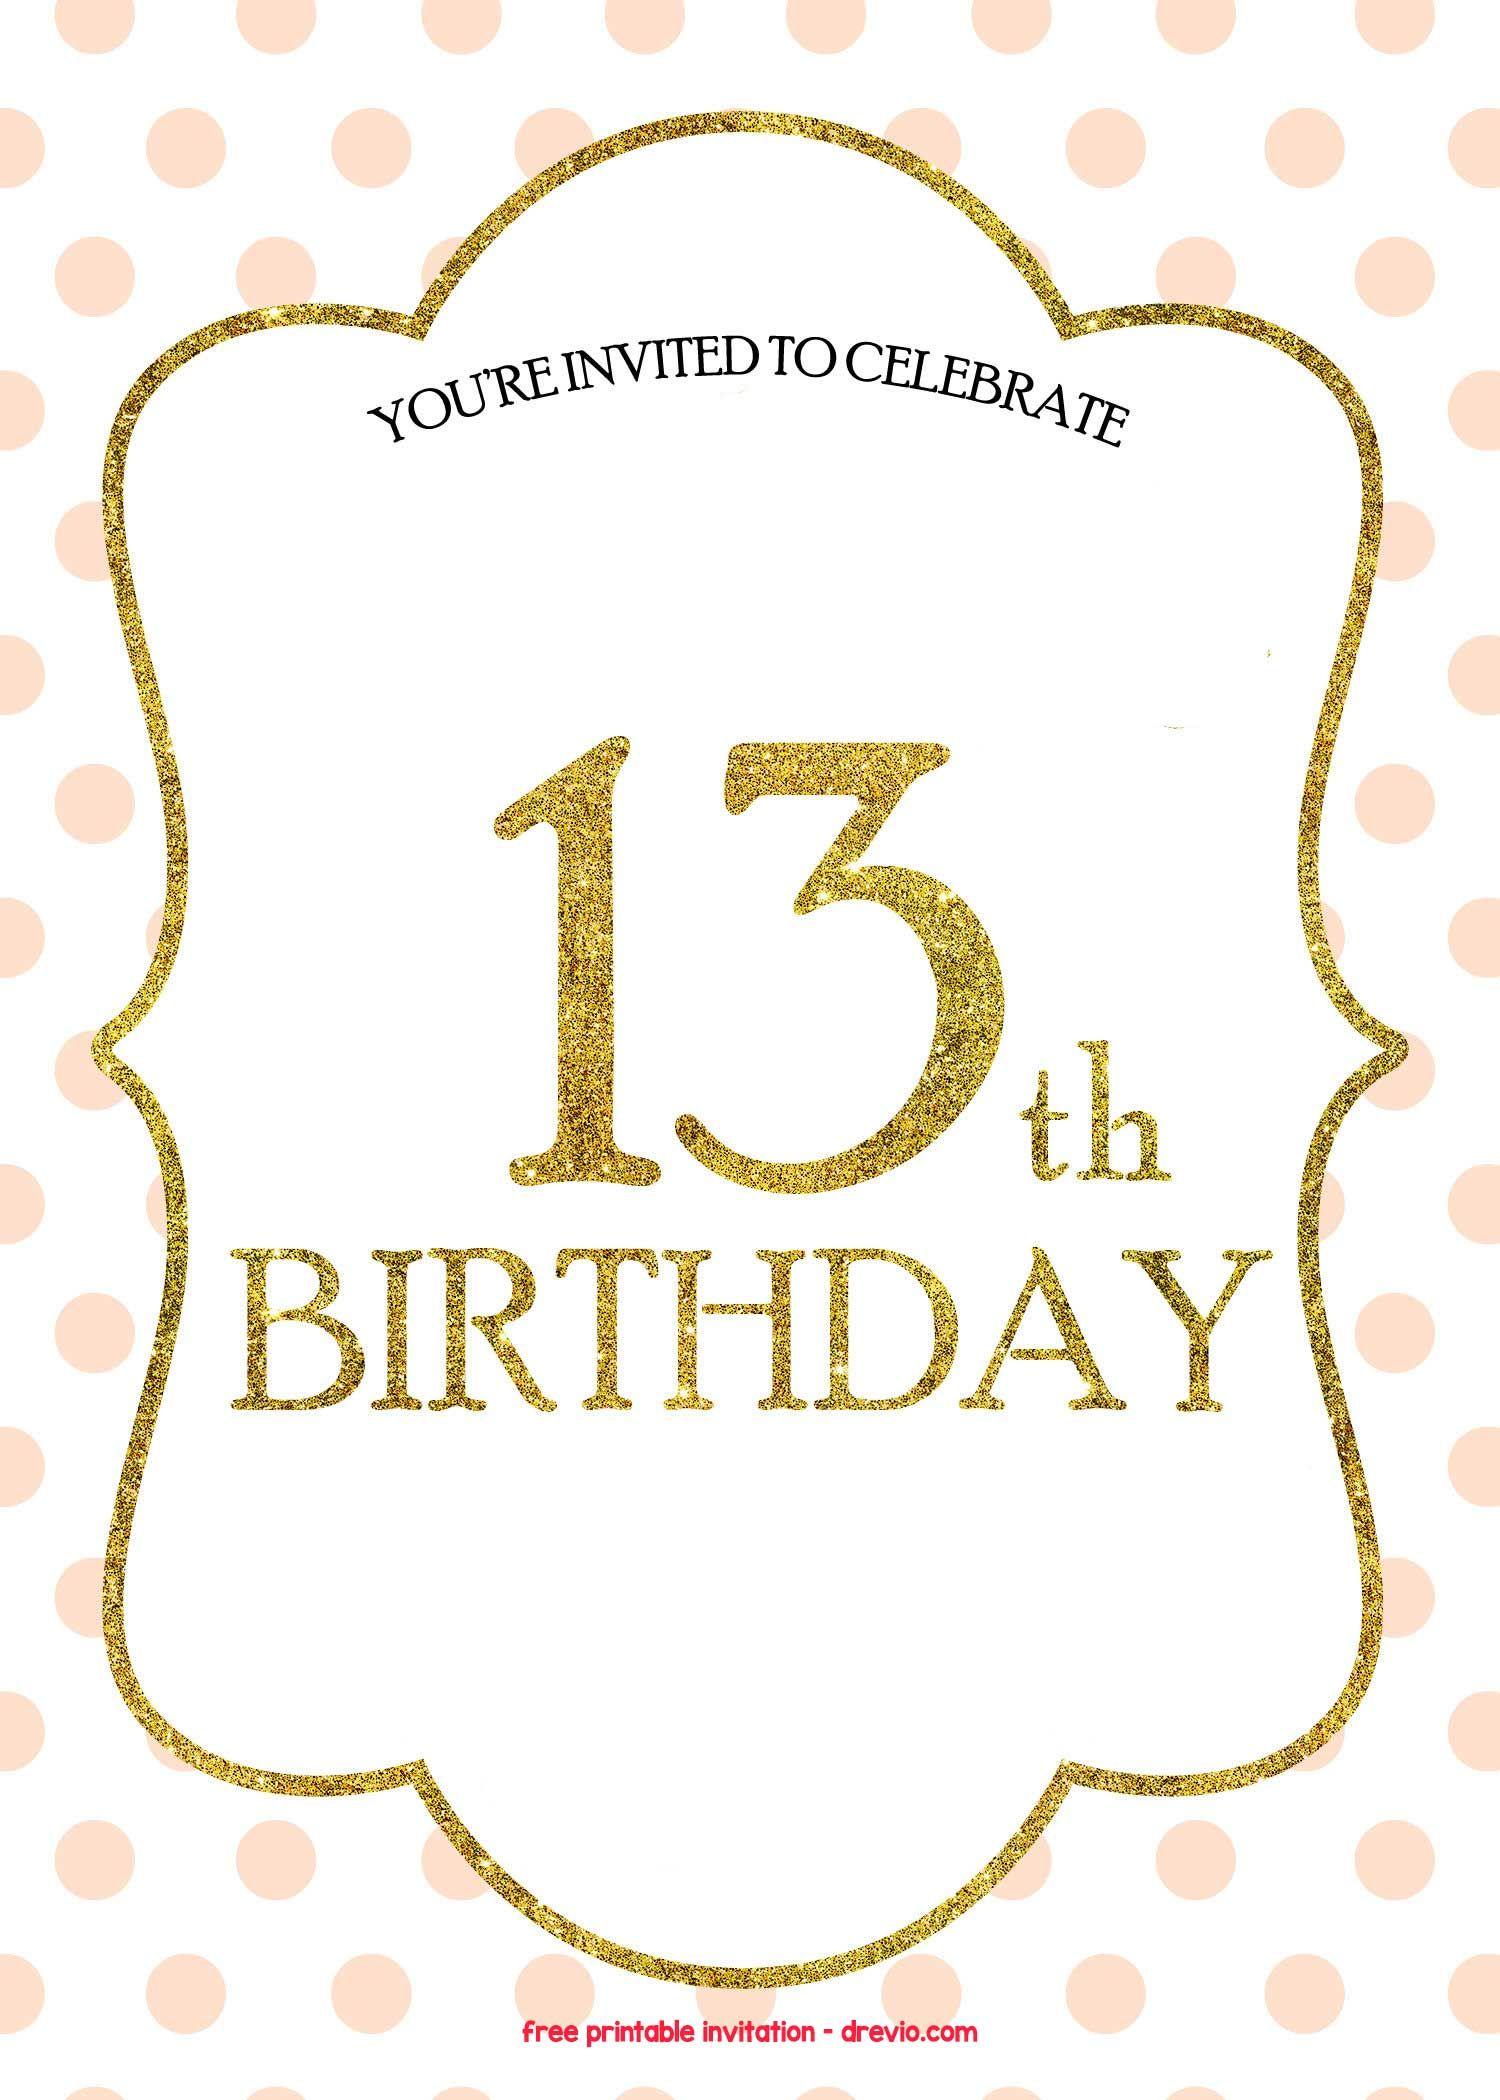 Free 13th Birthday Invitations Templates 13th Birthday Invitations Printable Birthday Invitations Printable Invitations